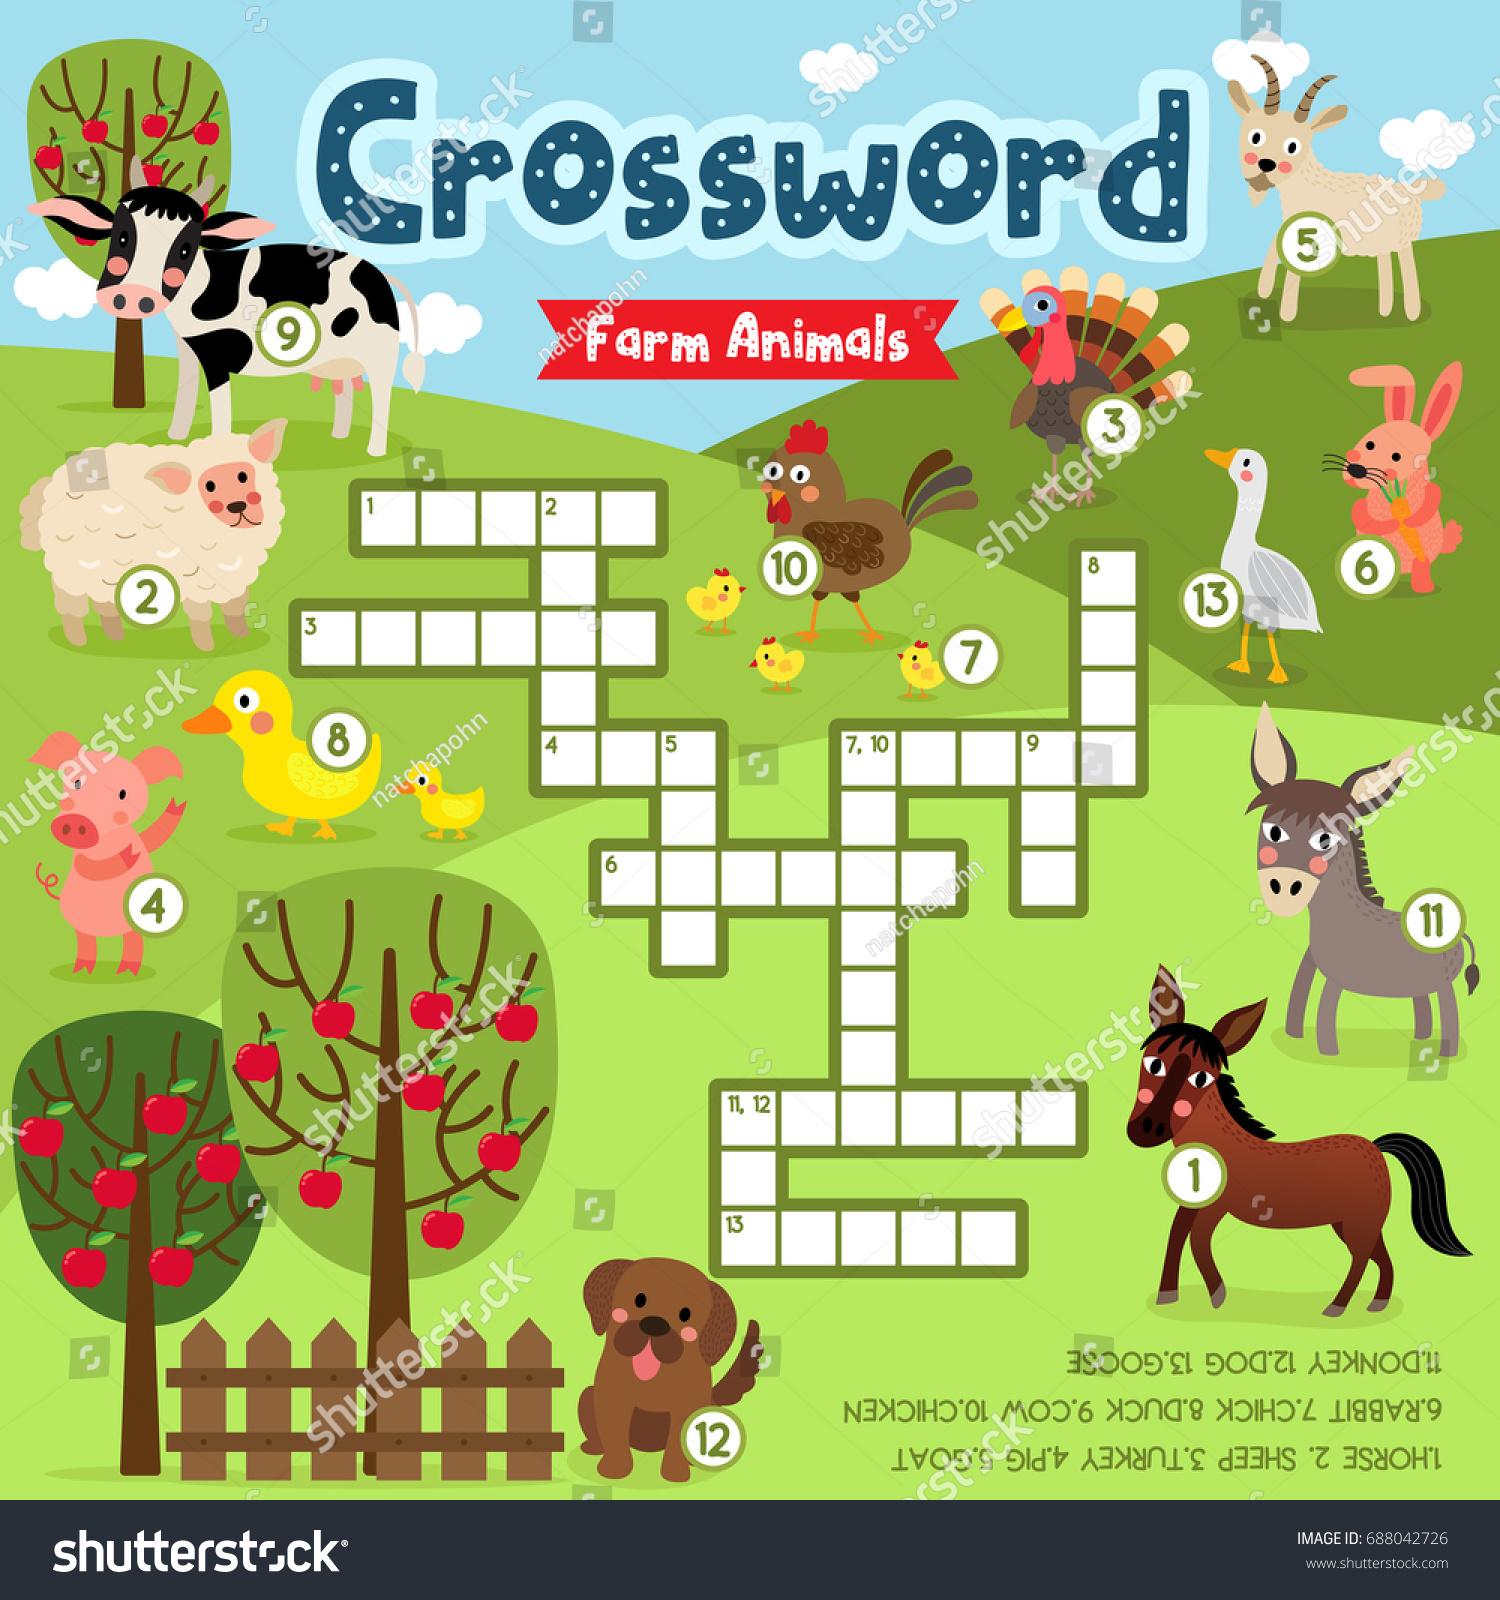 Crosswords Puzzle Game Farm Animals Preschool Stock Vector